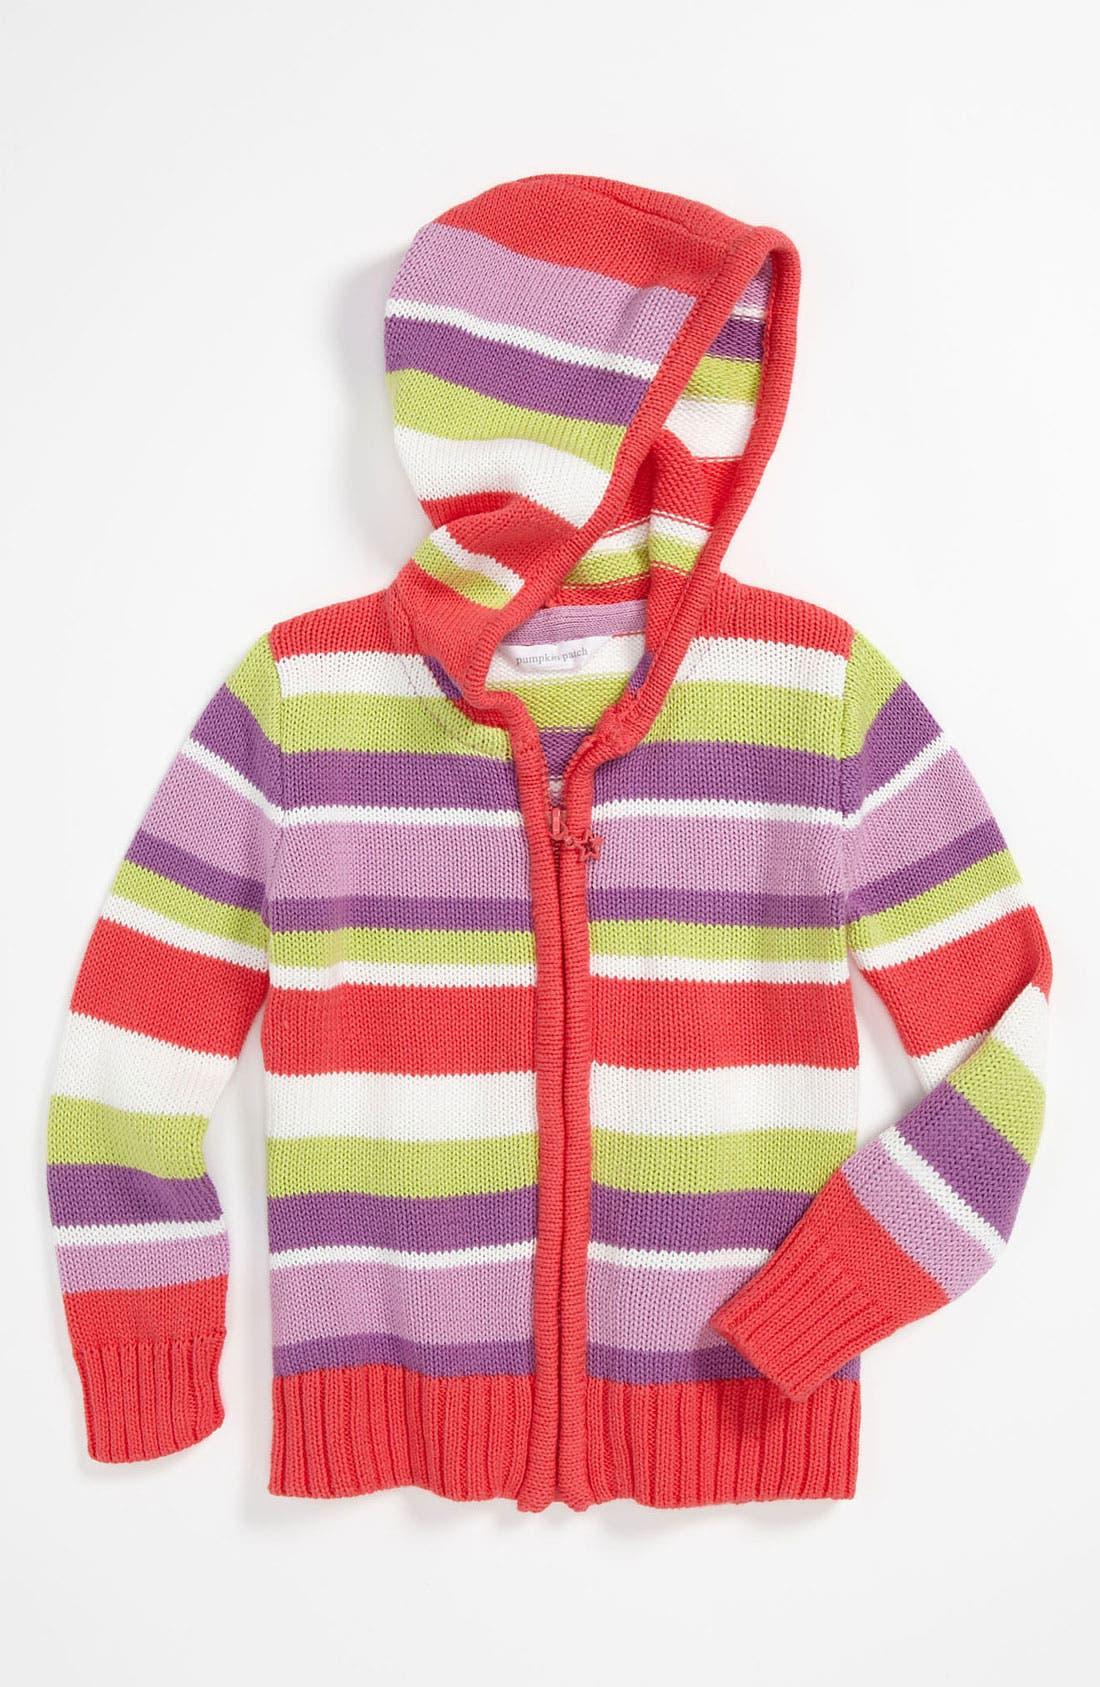 Main Image - Pumpkin Patch Hooded Cardigan (Toddler)